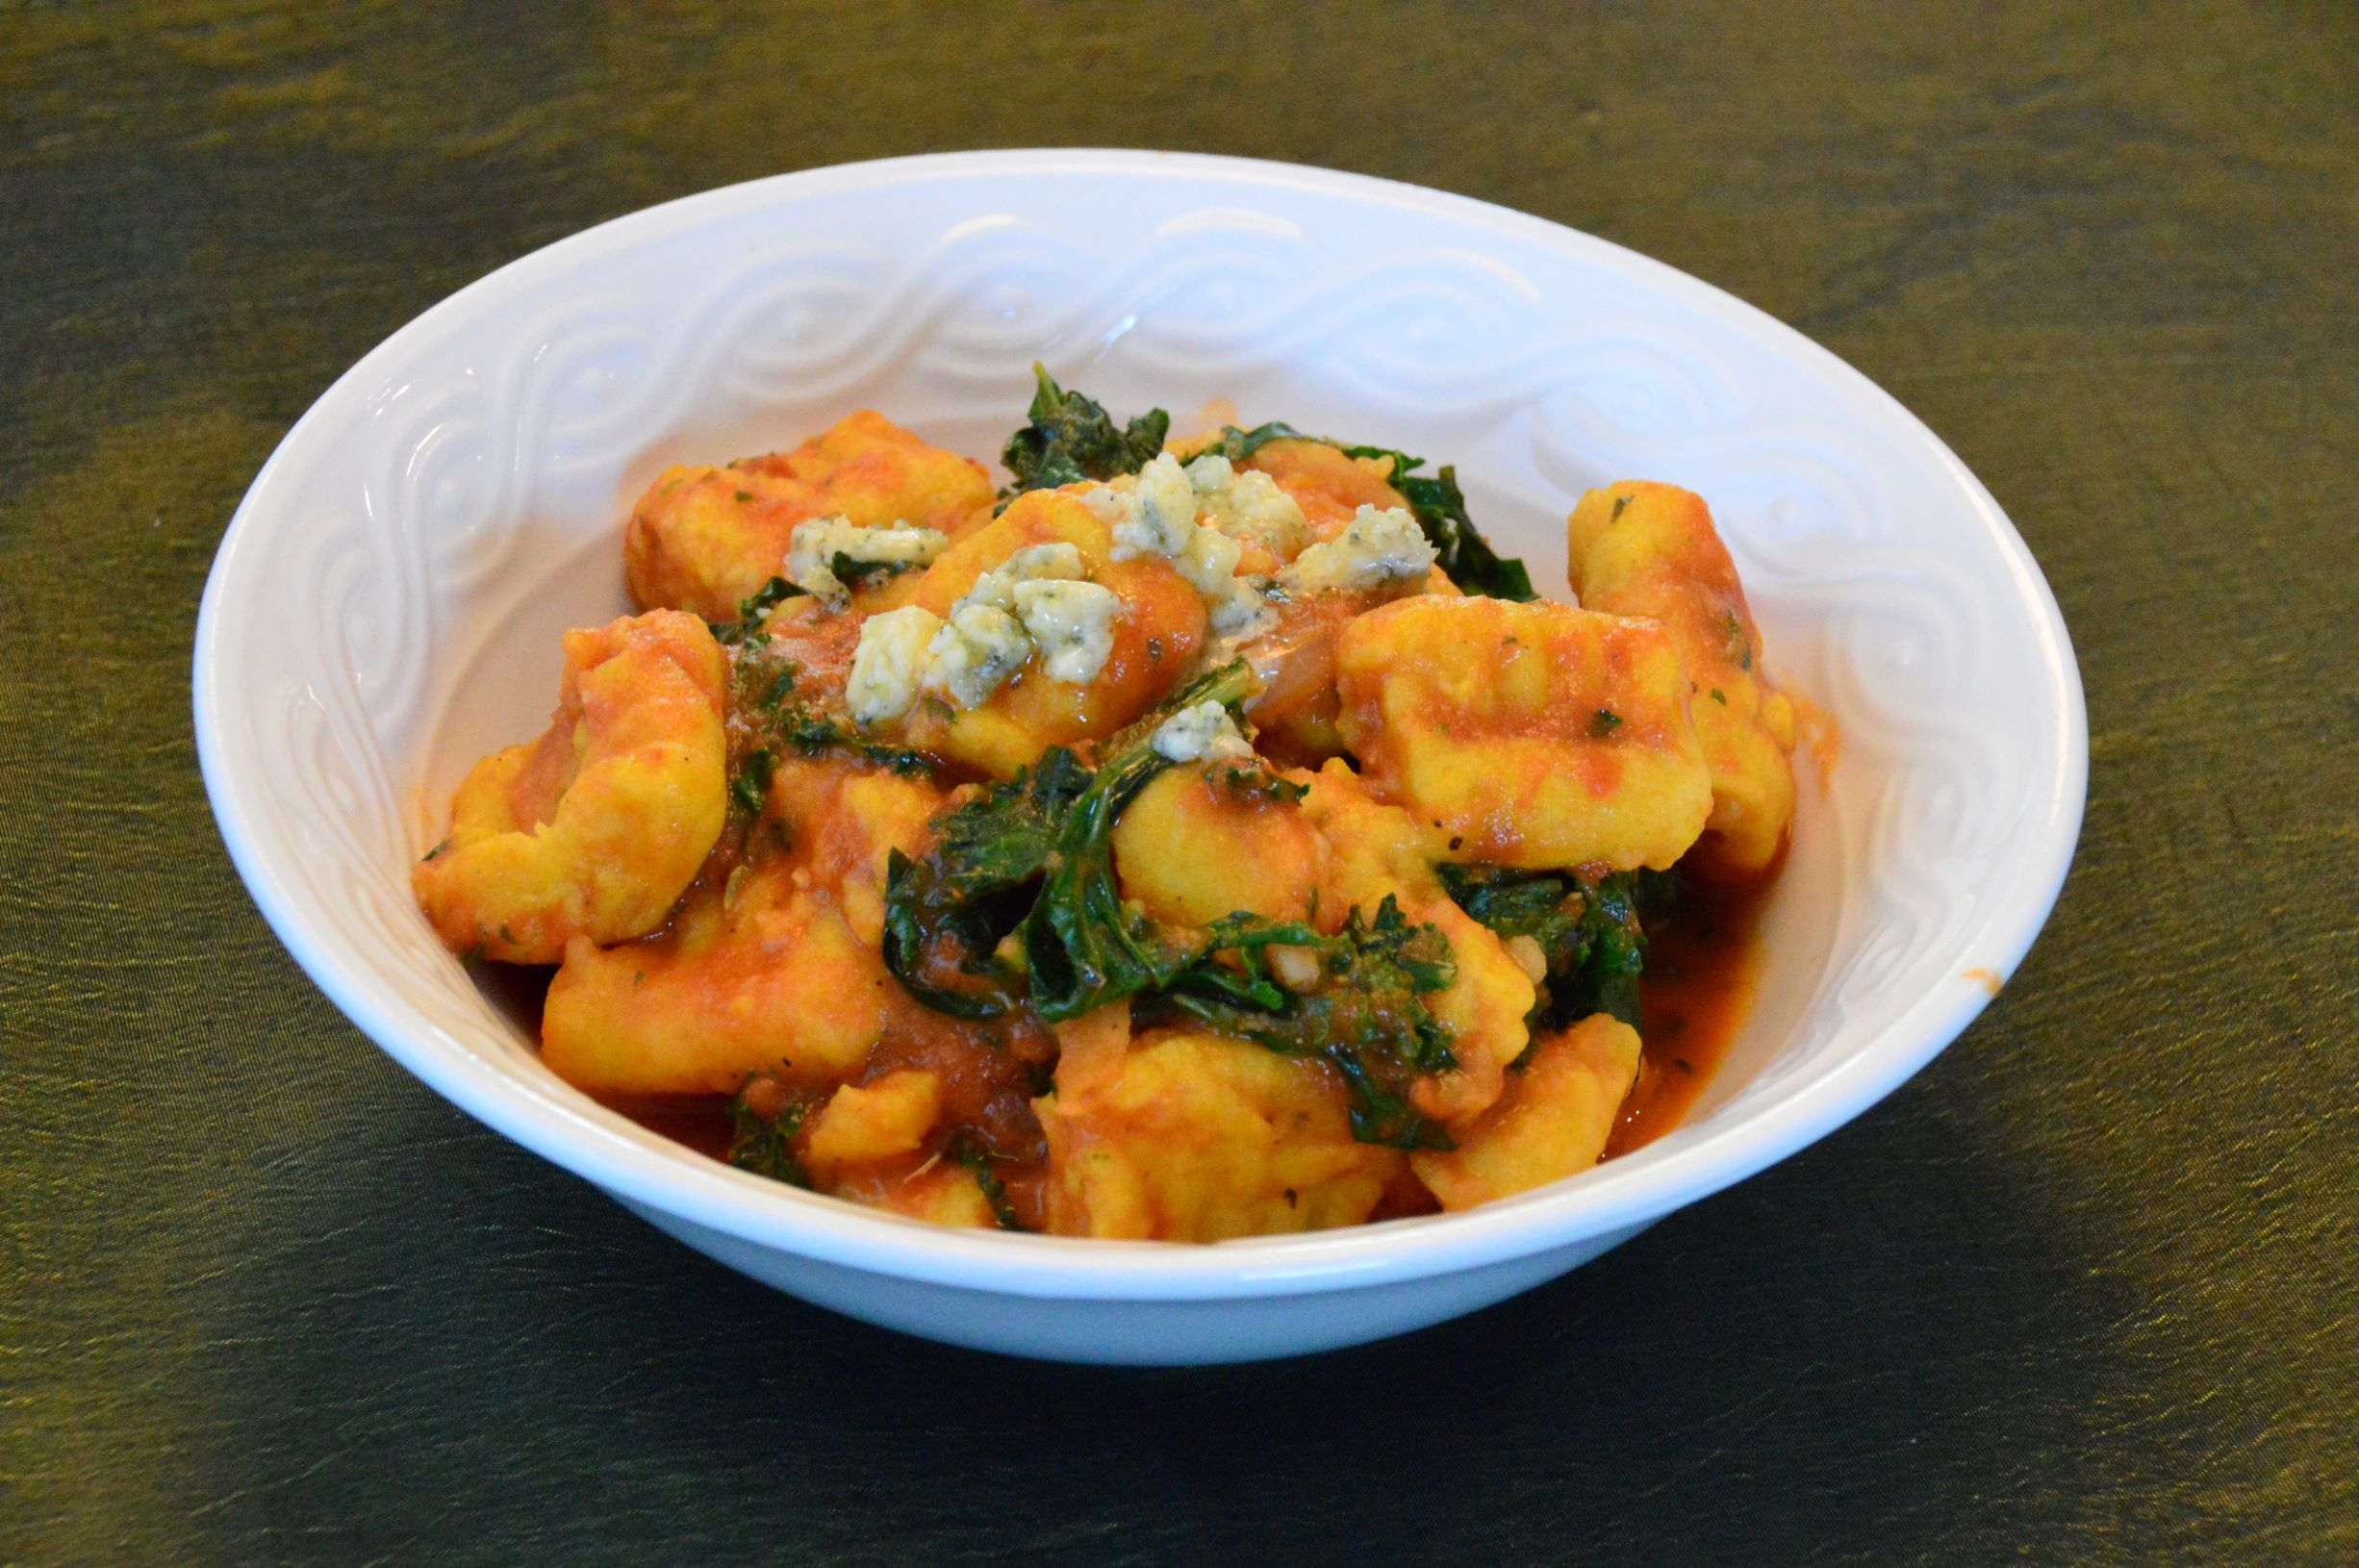 Gnocchi (Potato Pasta)